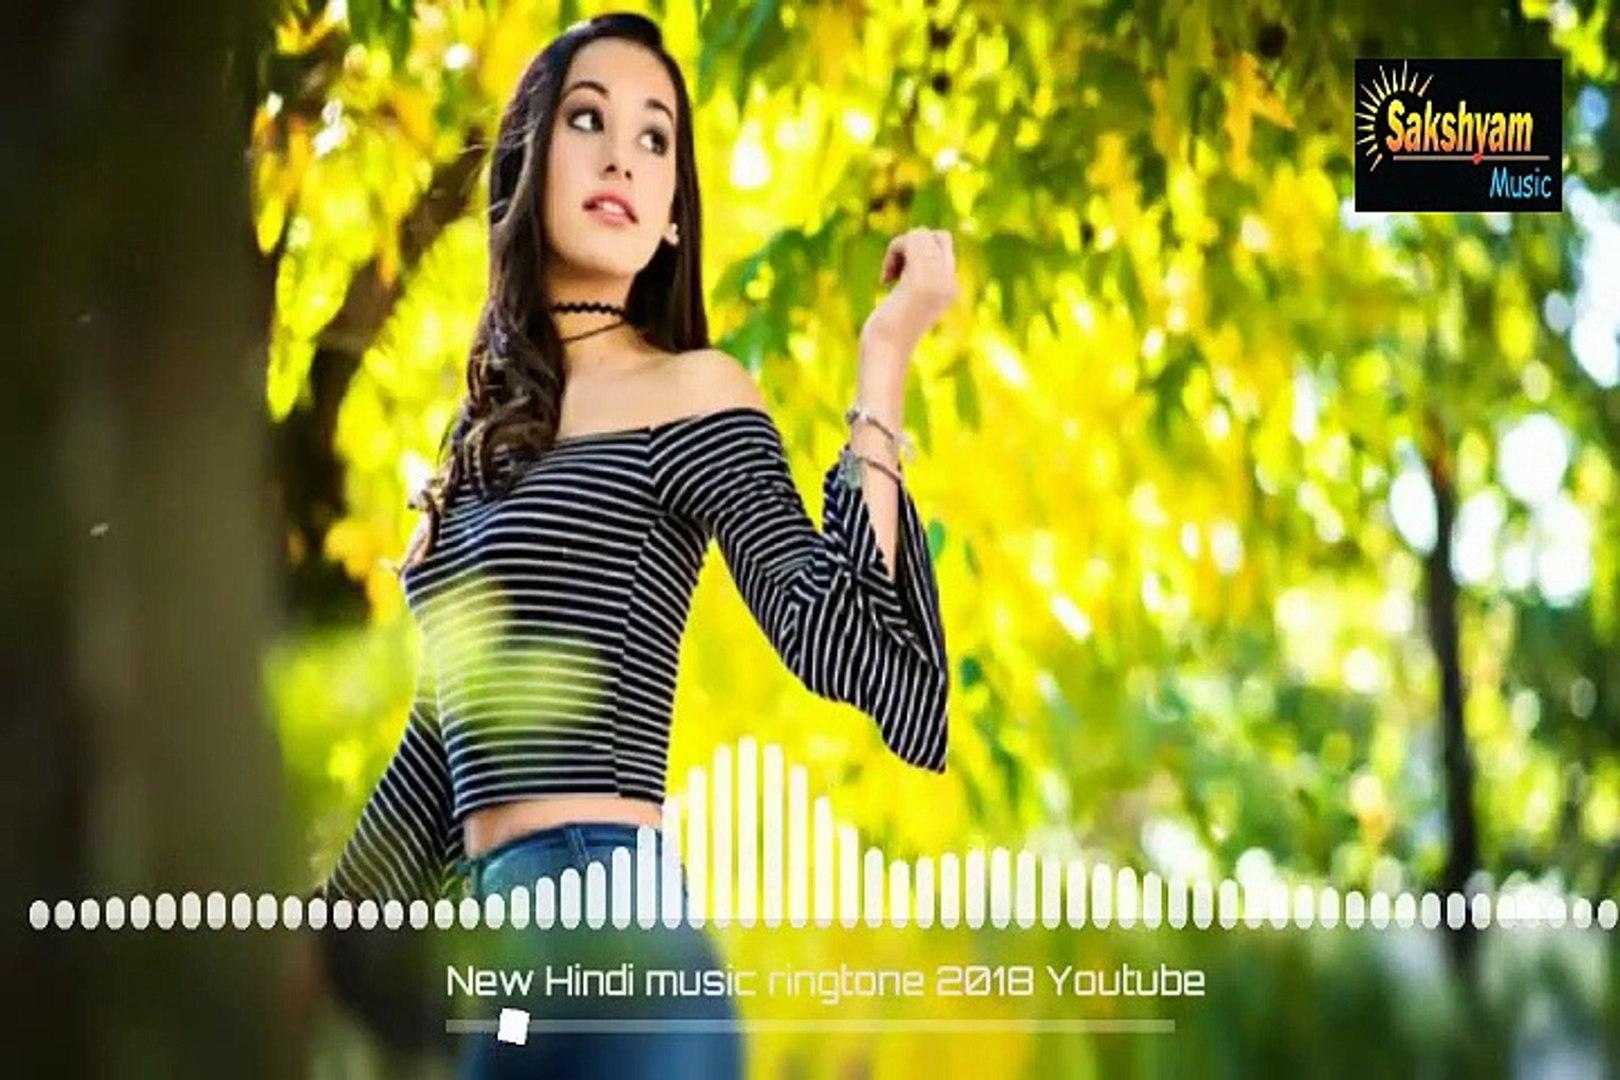 Hindi love music ringtone arabic new